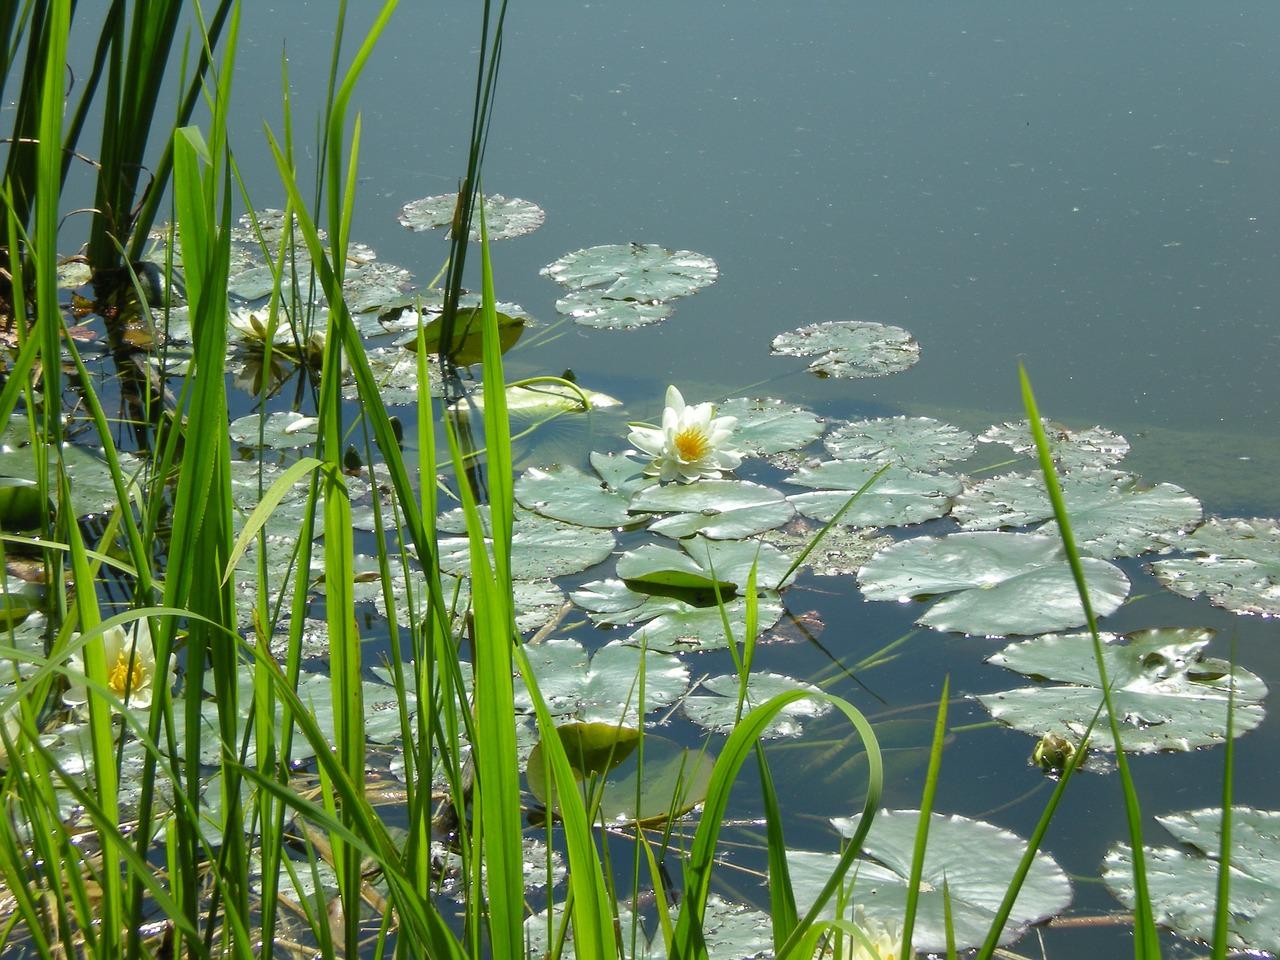 Lakeflowerssummerplantblossom Free Photo From Needpix